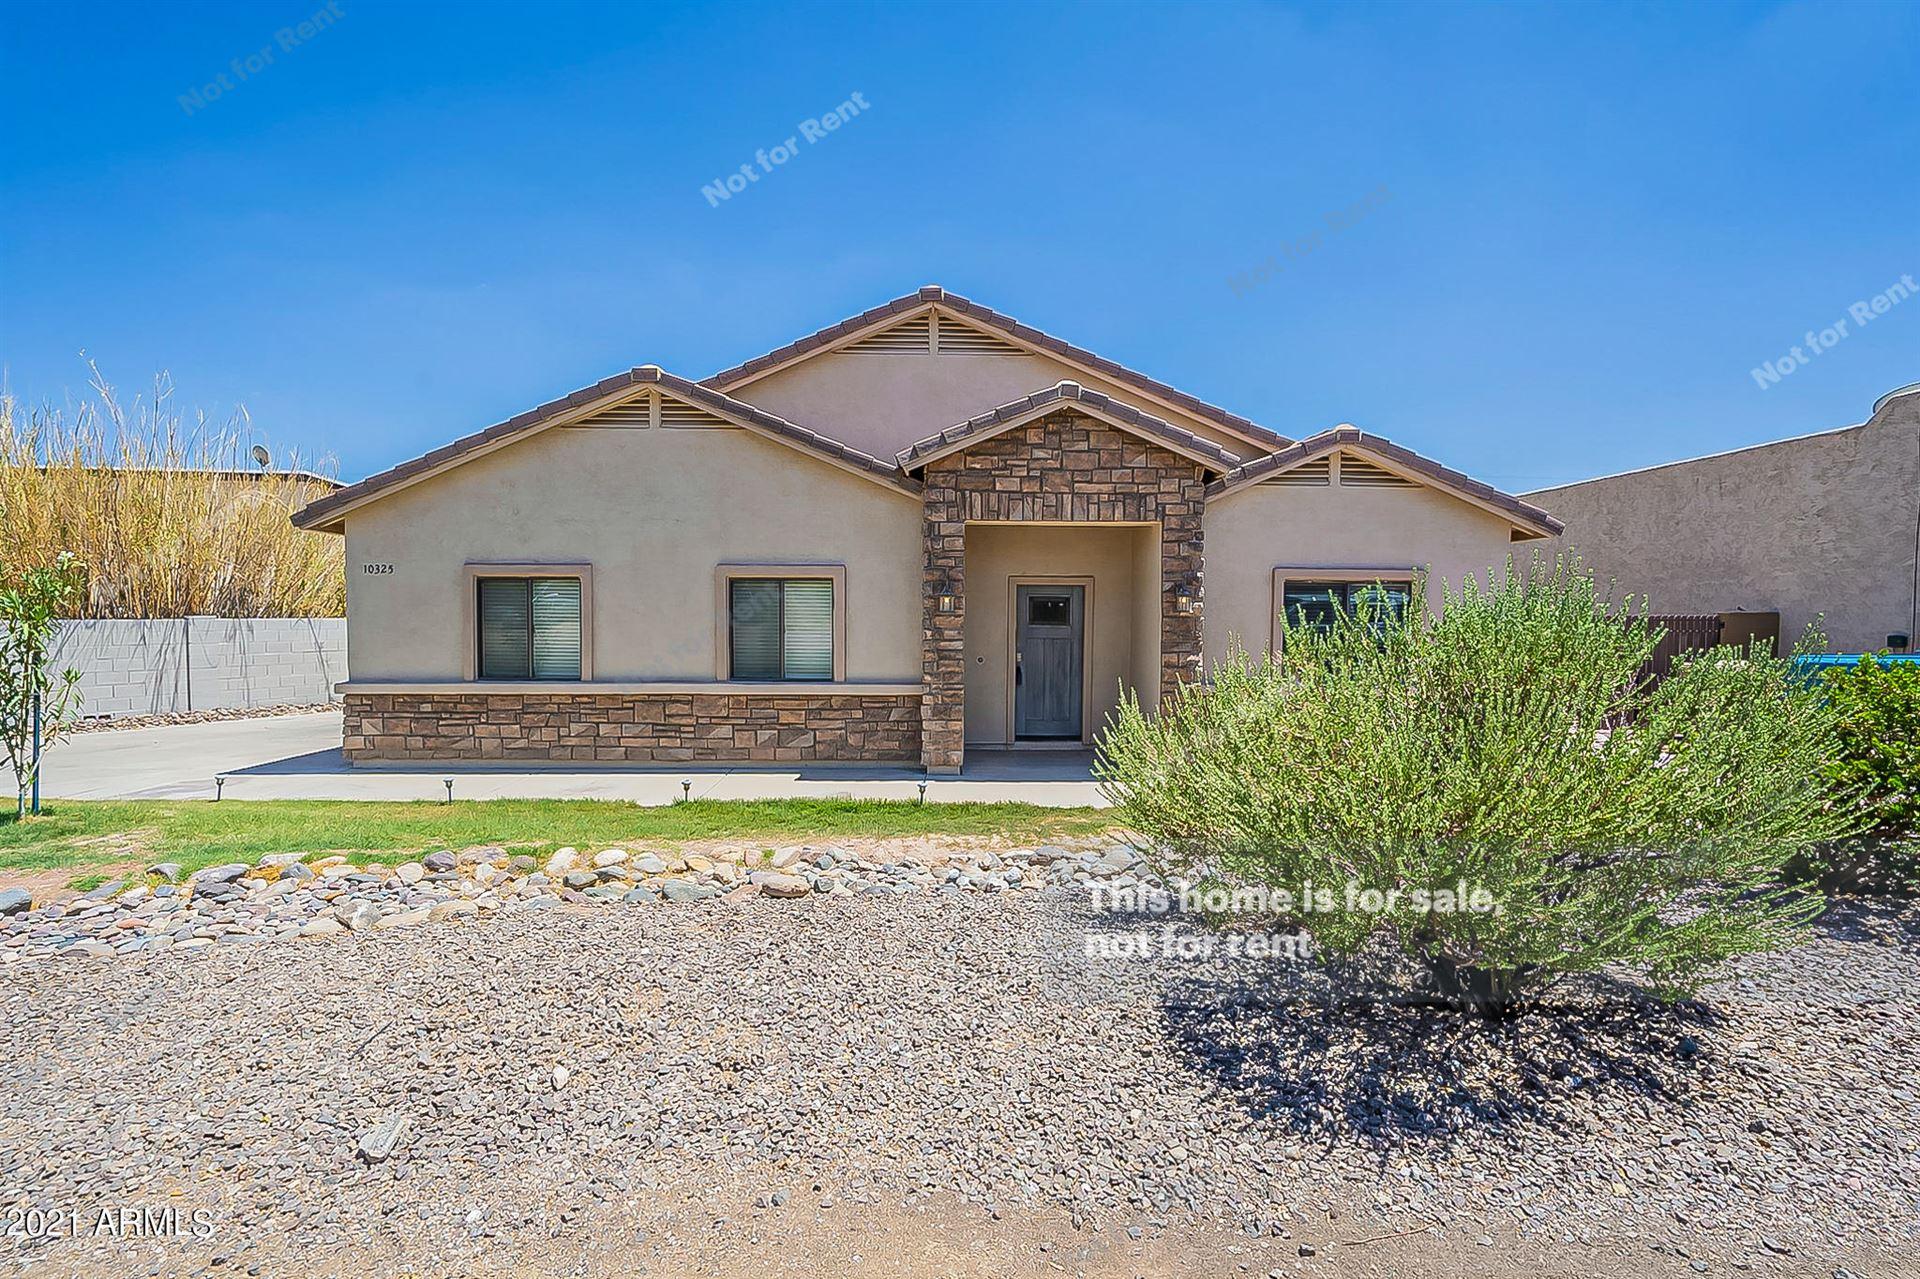 10325 E LA PALMA Avenue, Gold Canyon, AZ 85118 - MLS#: 6256830